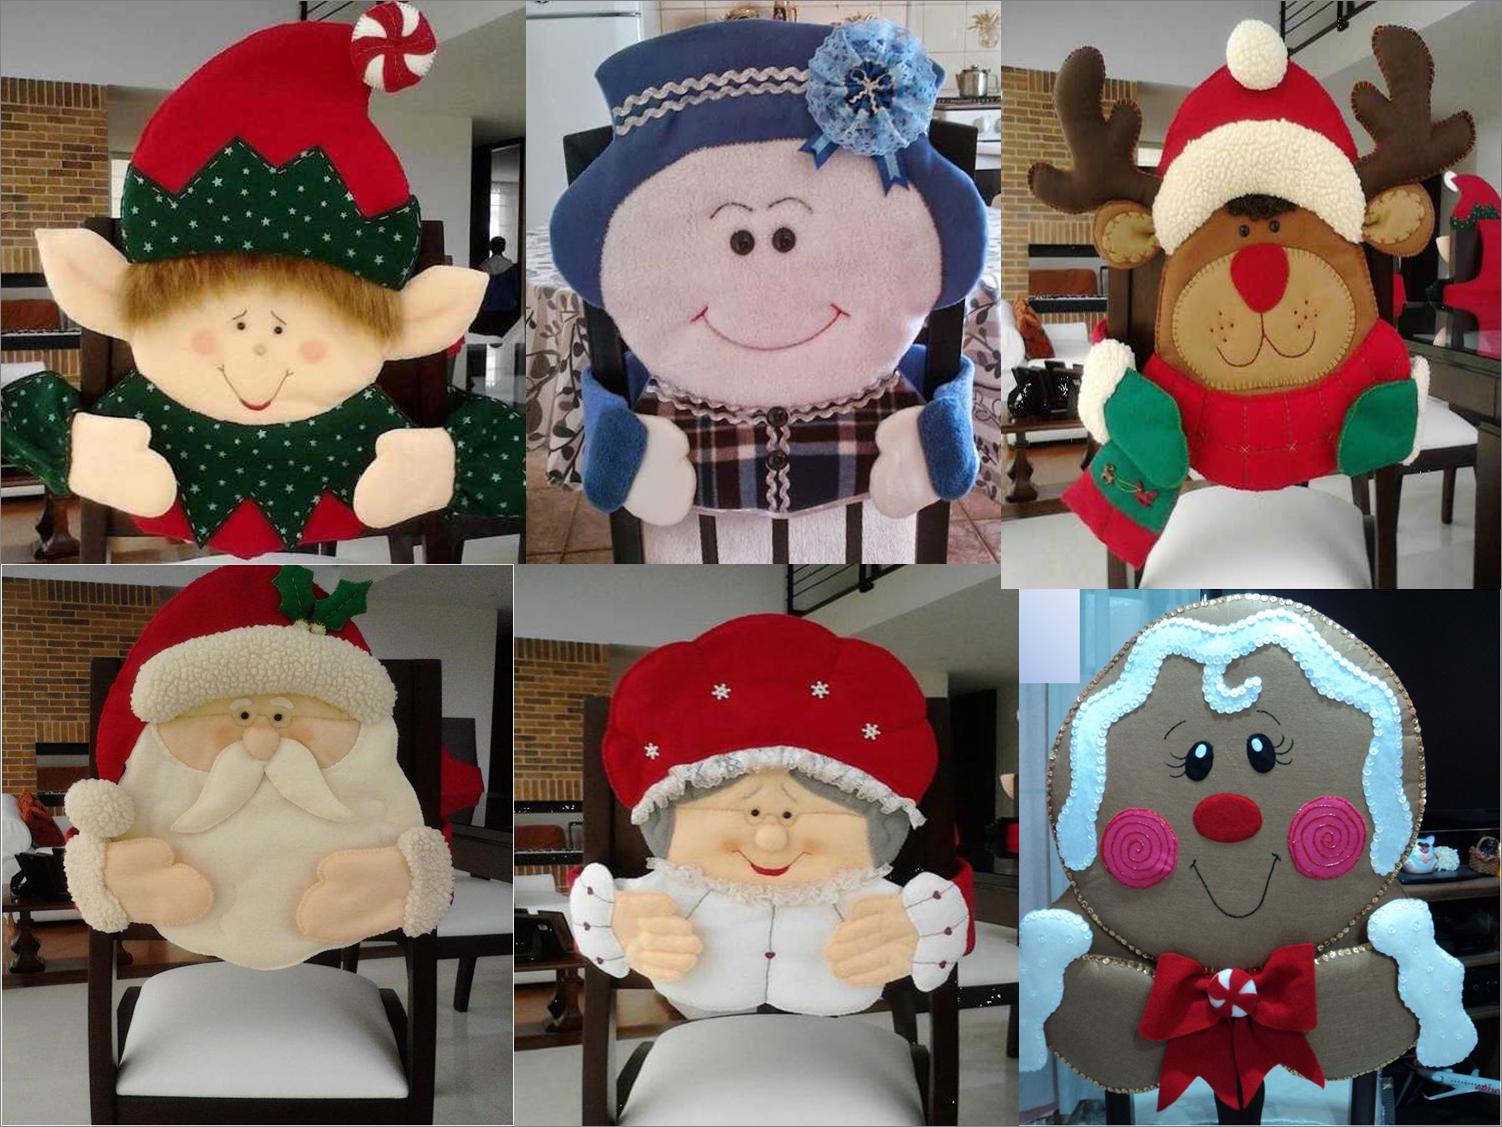 Christmas chair covers - Belem Qi Gong Christmas Stuff Christmas Ornaments Xmas Chair Covers Table Runners Christmas Decorations Christmas